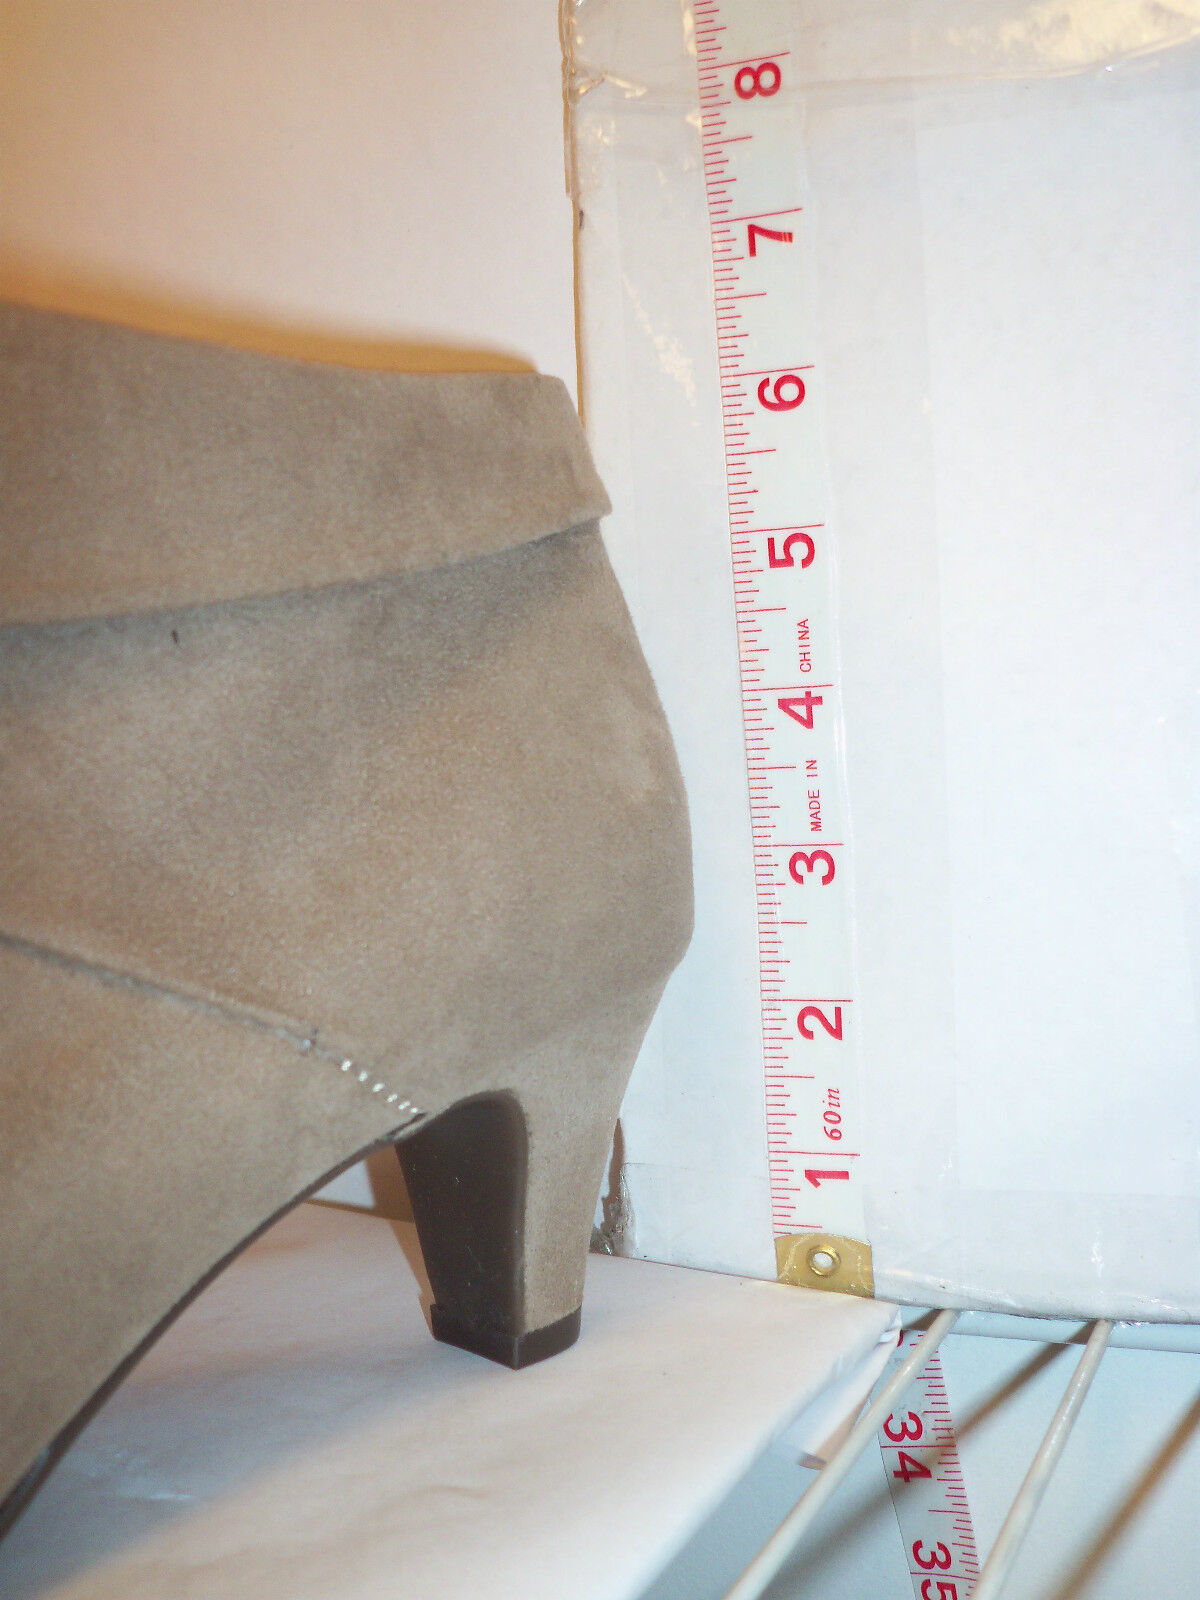 Aerosoles NEU Damenschuhe 6 M Play Pleat Mink Combo Heels Schuhes